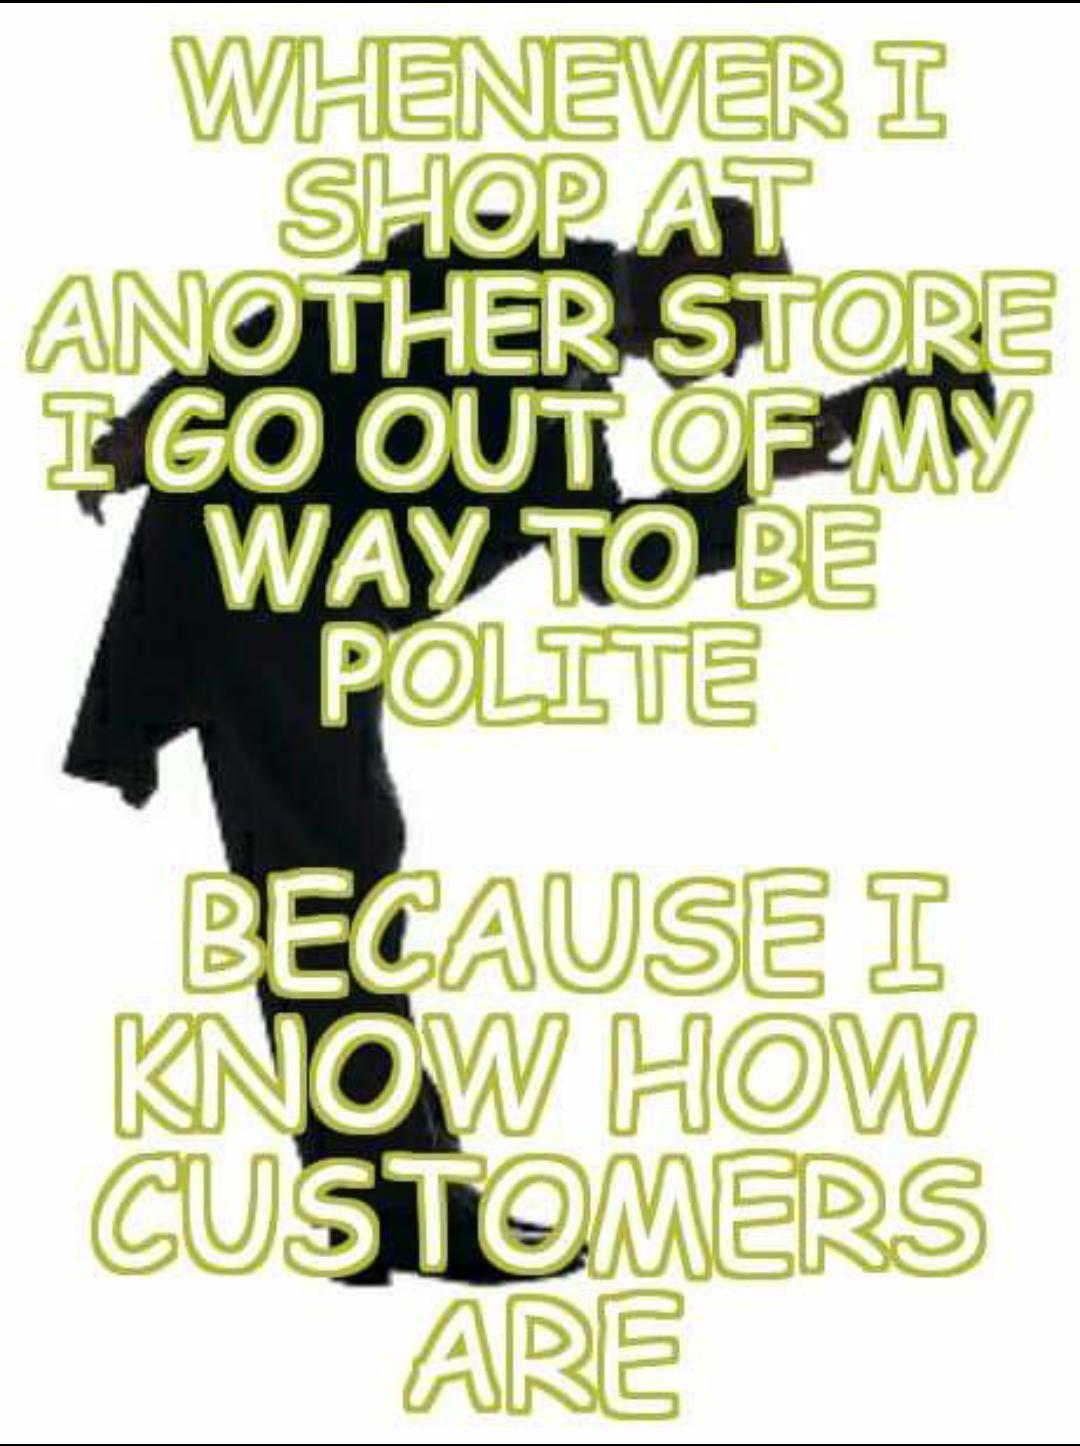 Memes Mean retail employees